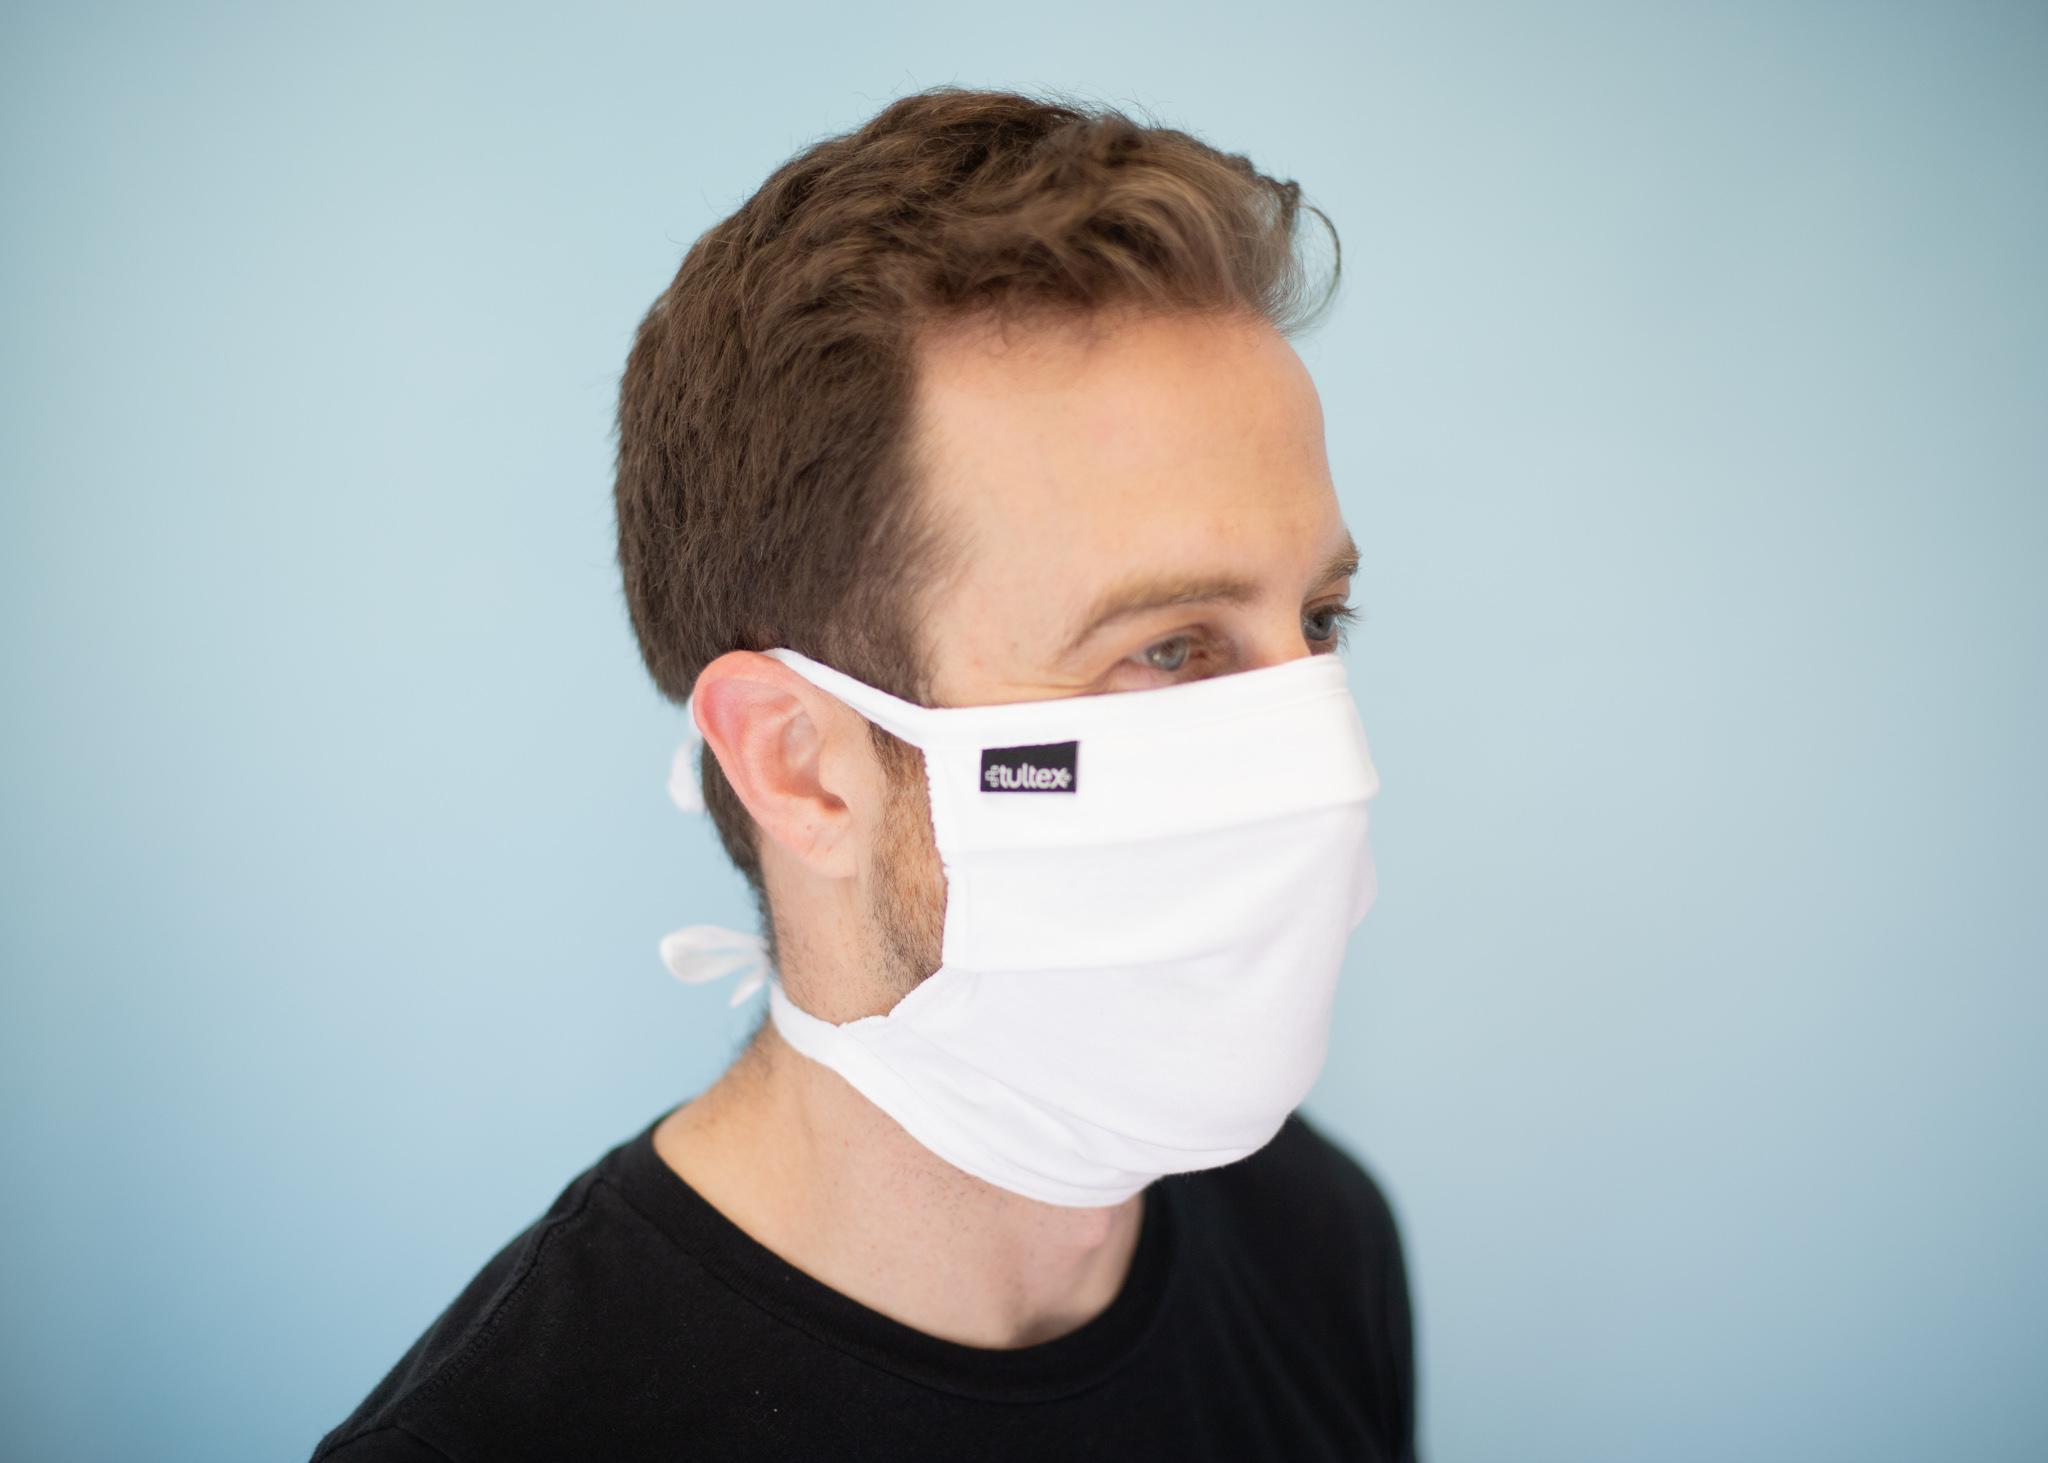 mark wearing white mask